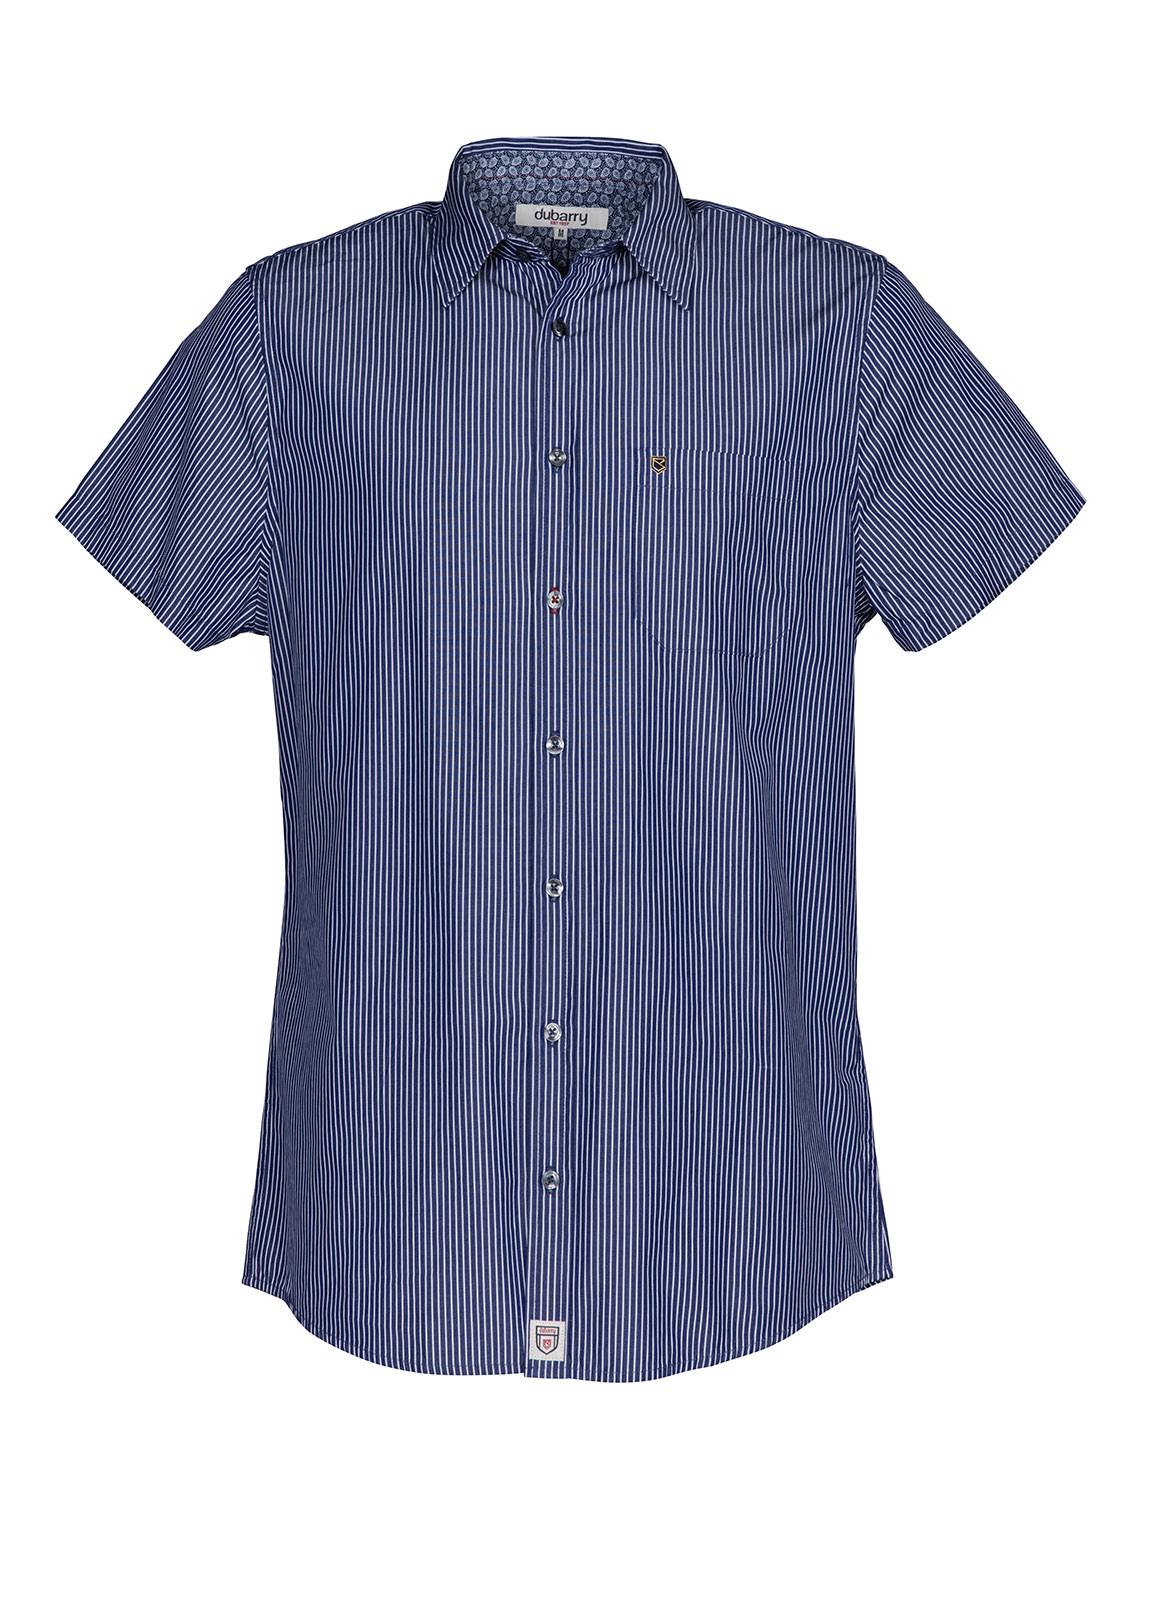 Castlecoote Shirt - Navy